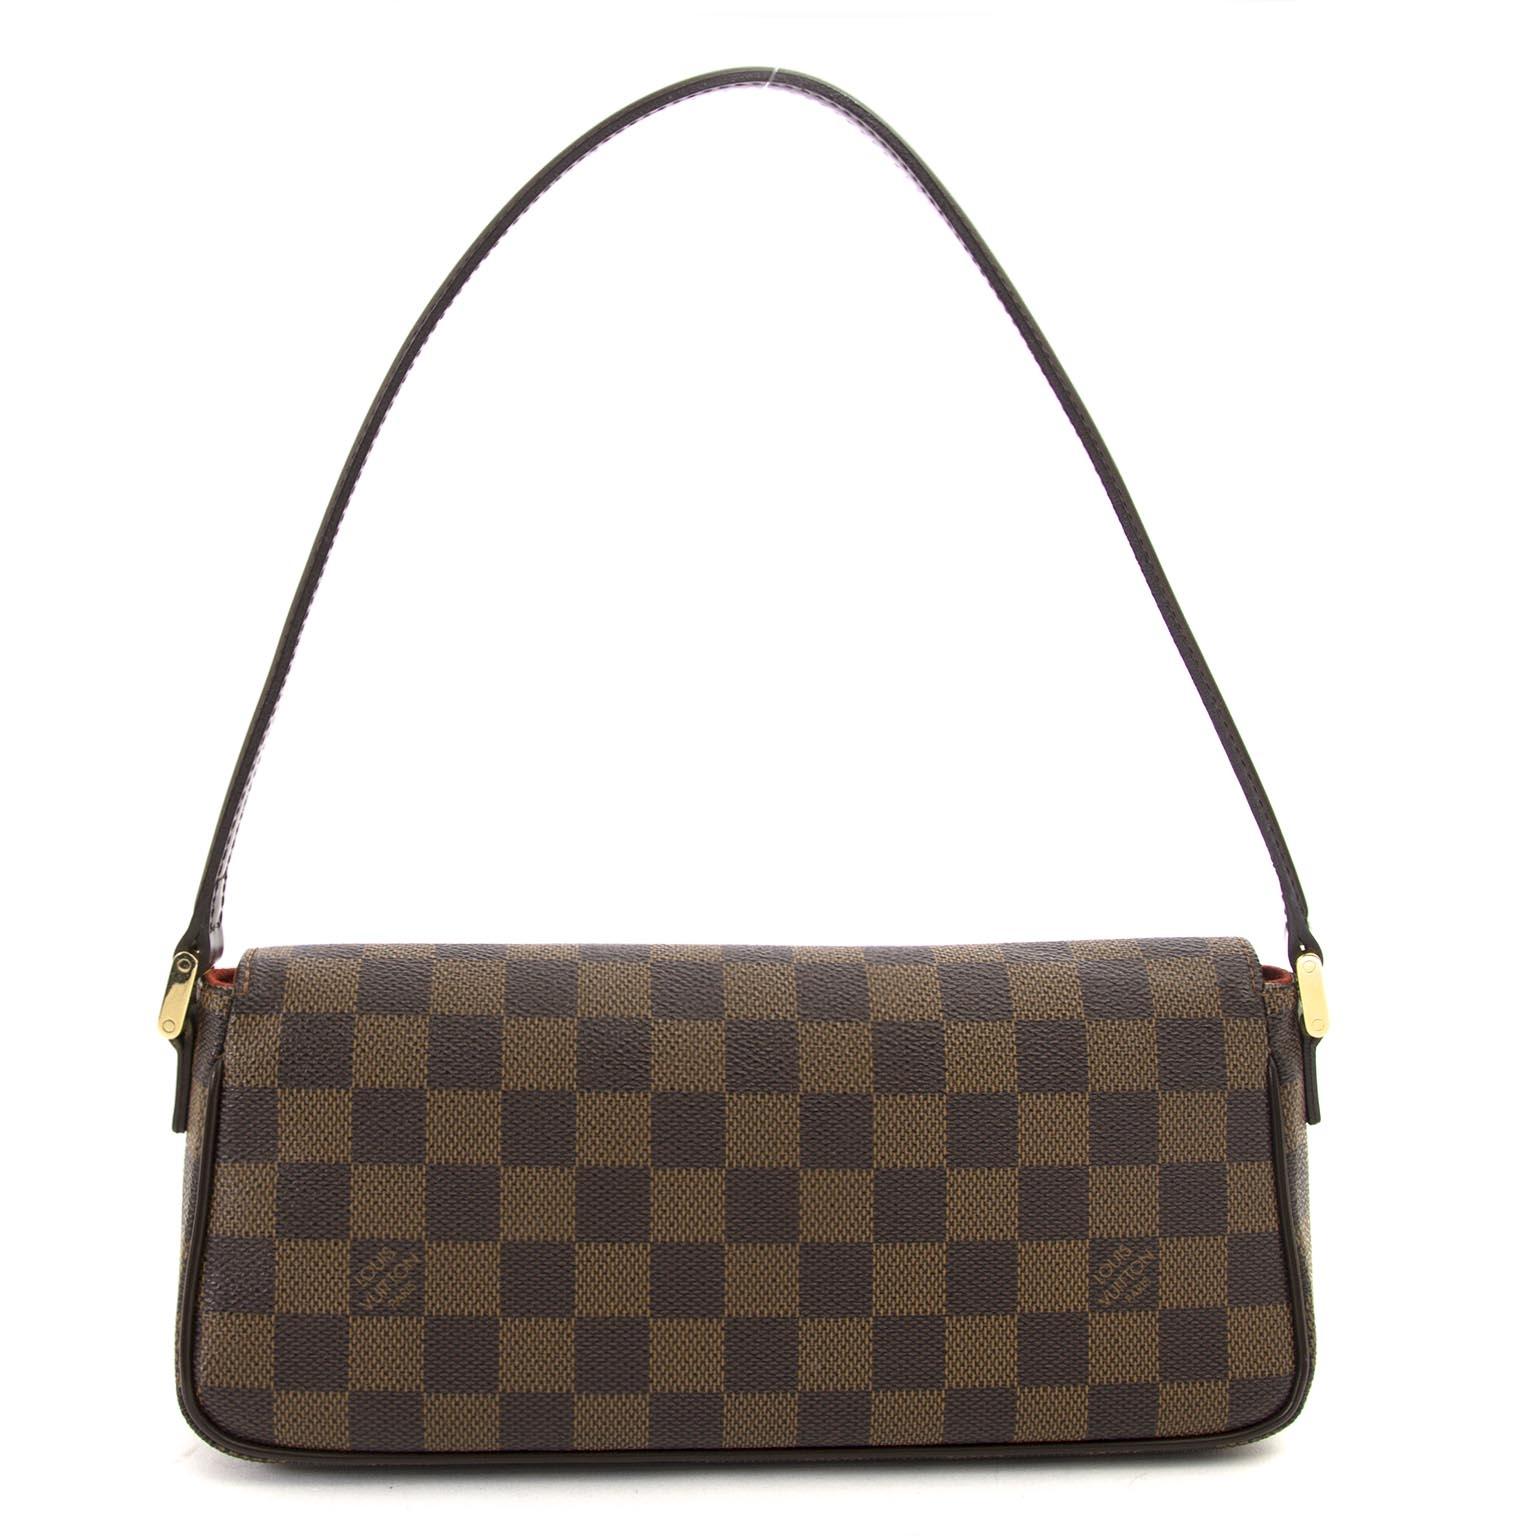 shop safe online secondhand Louis Vuitton Damier Ebene Recoleta Shoulder Bag